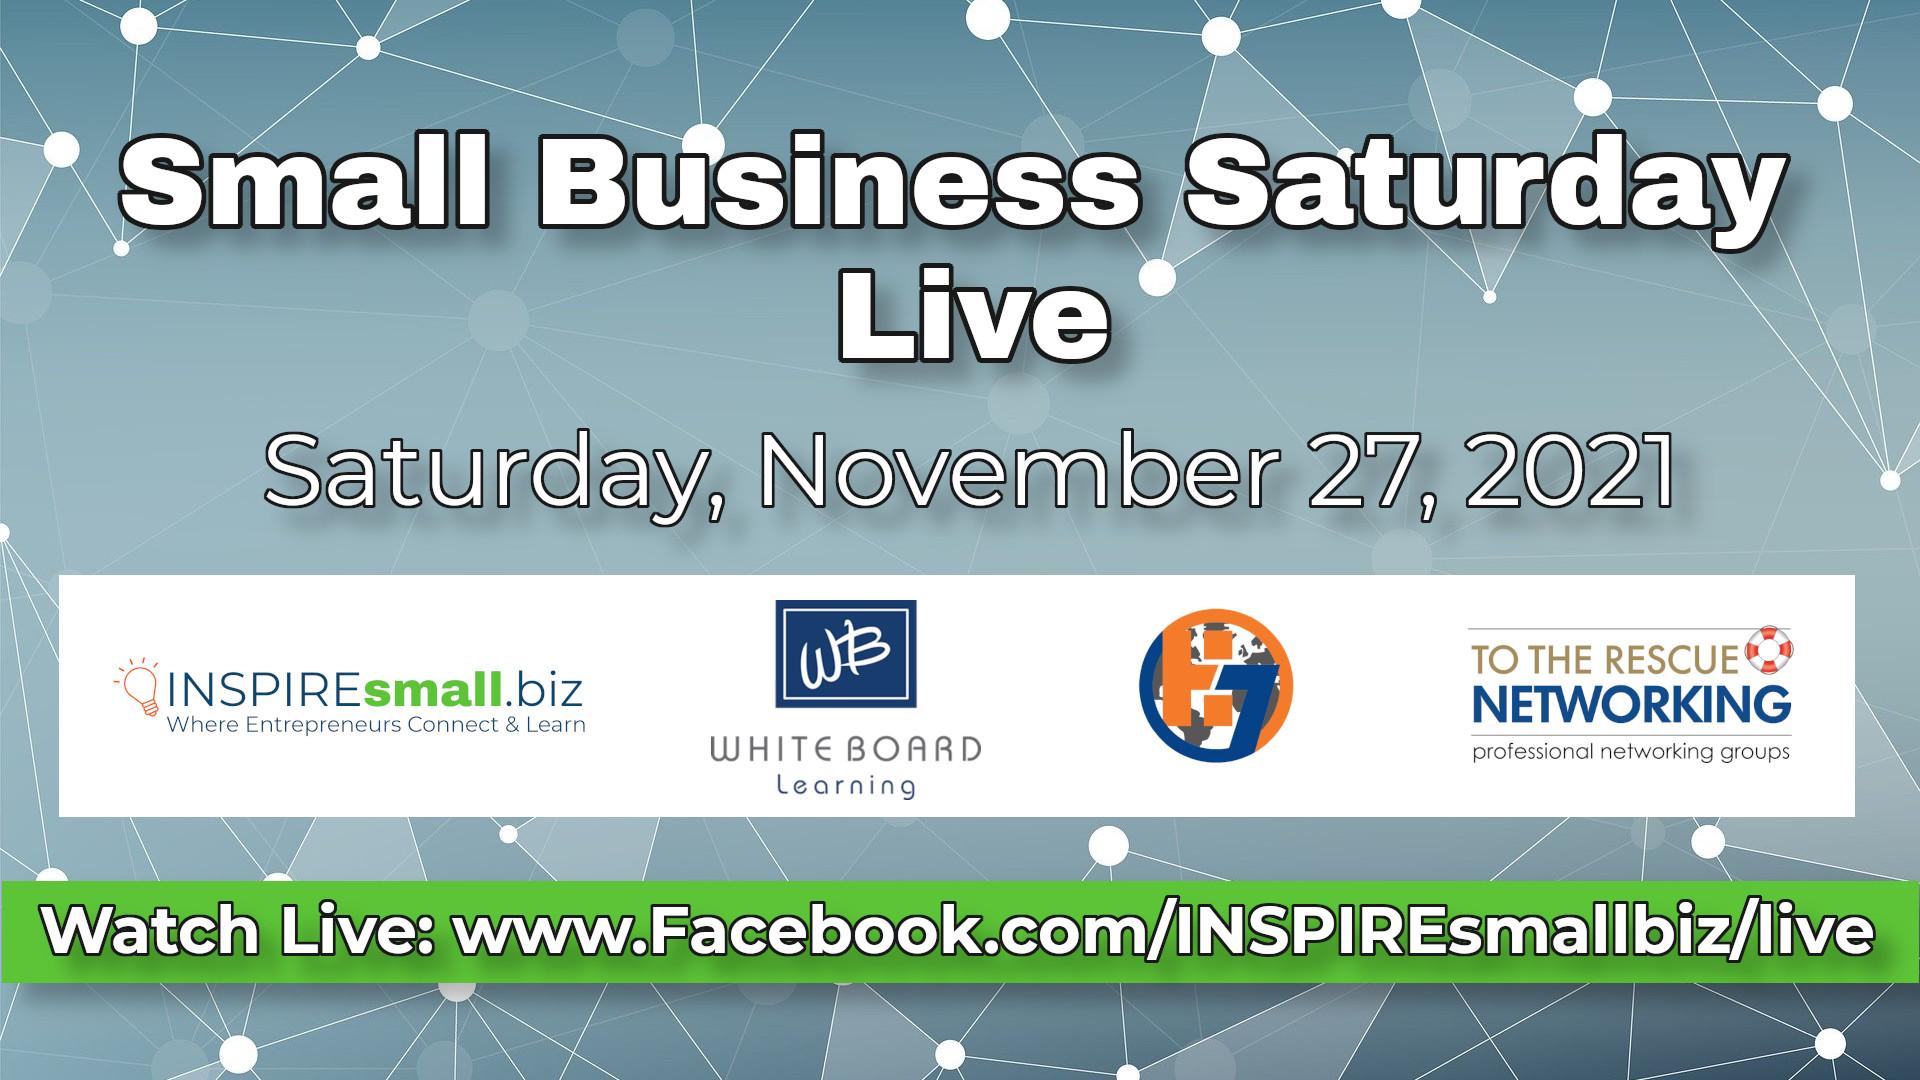 Small Business Saturday Live